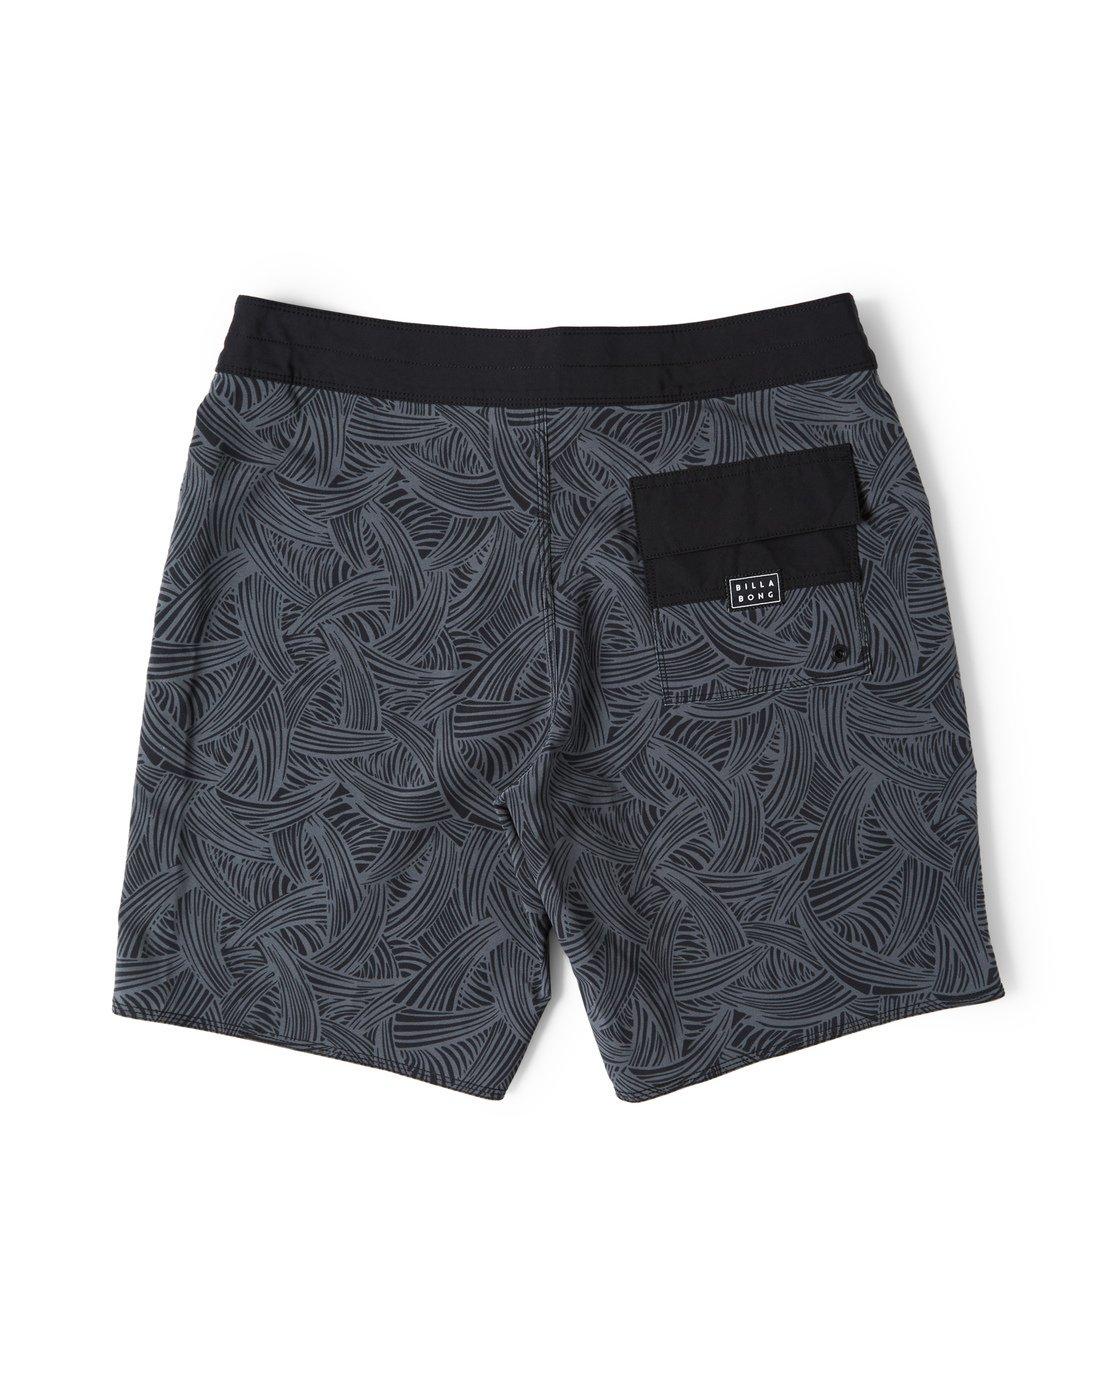 BILLABONG Mens Sundays Pro Boardshort Board Shorts